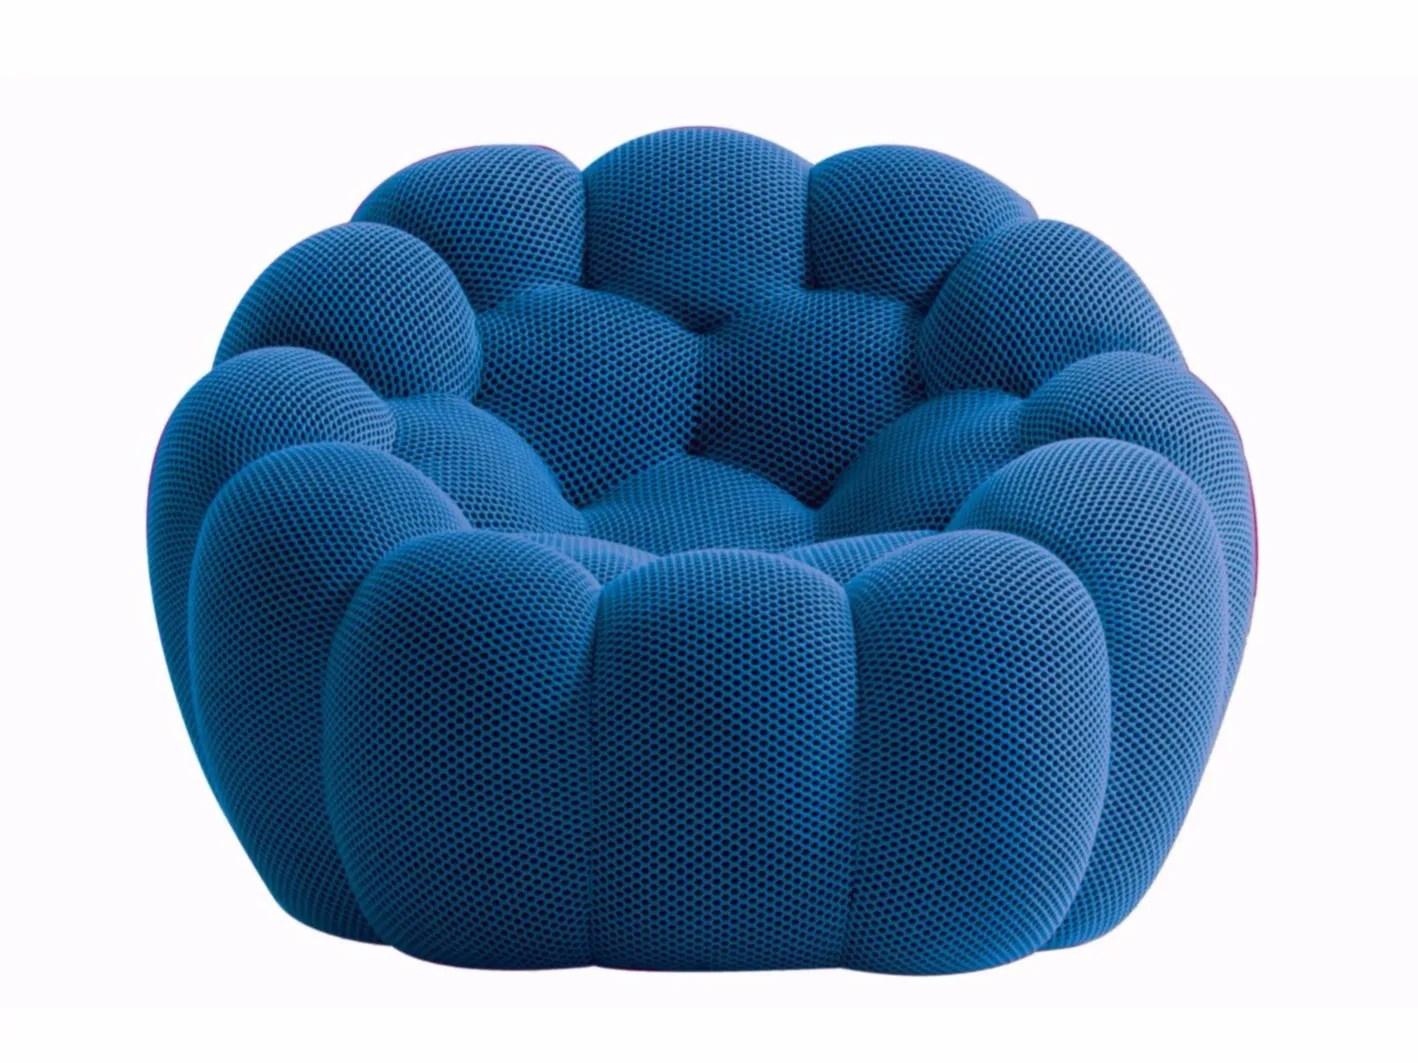 bubble sofa sacha lakic lay z boy prices fauteuil by roche bobois design